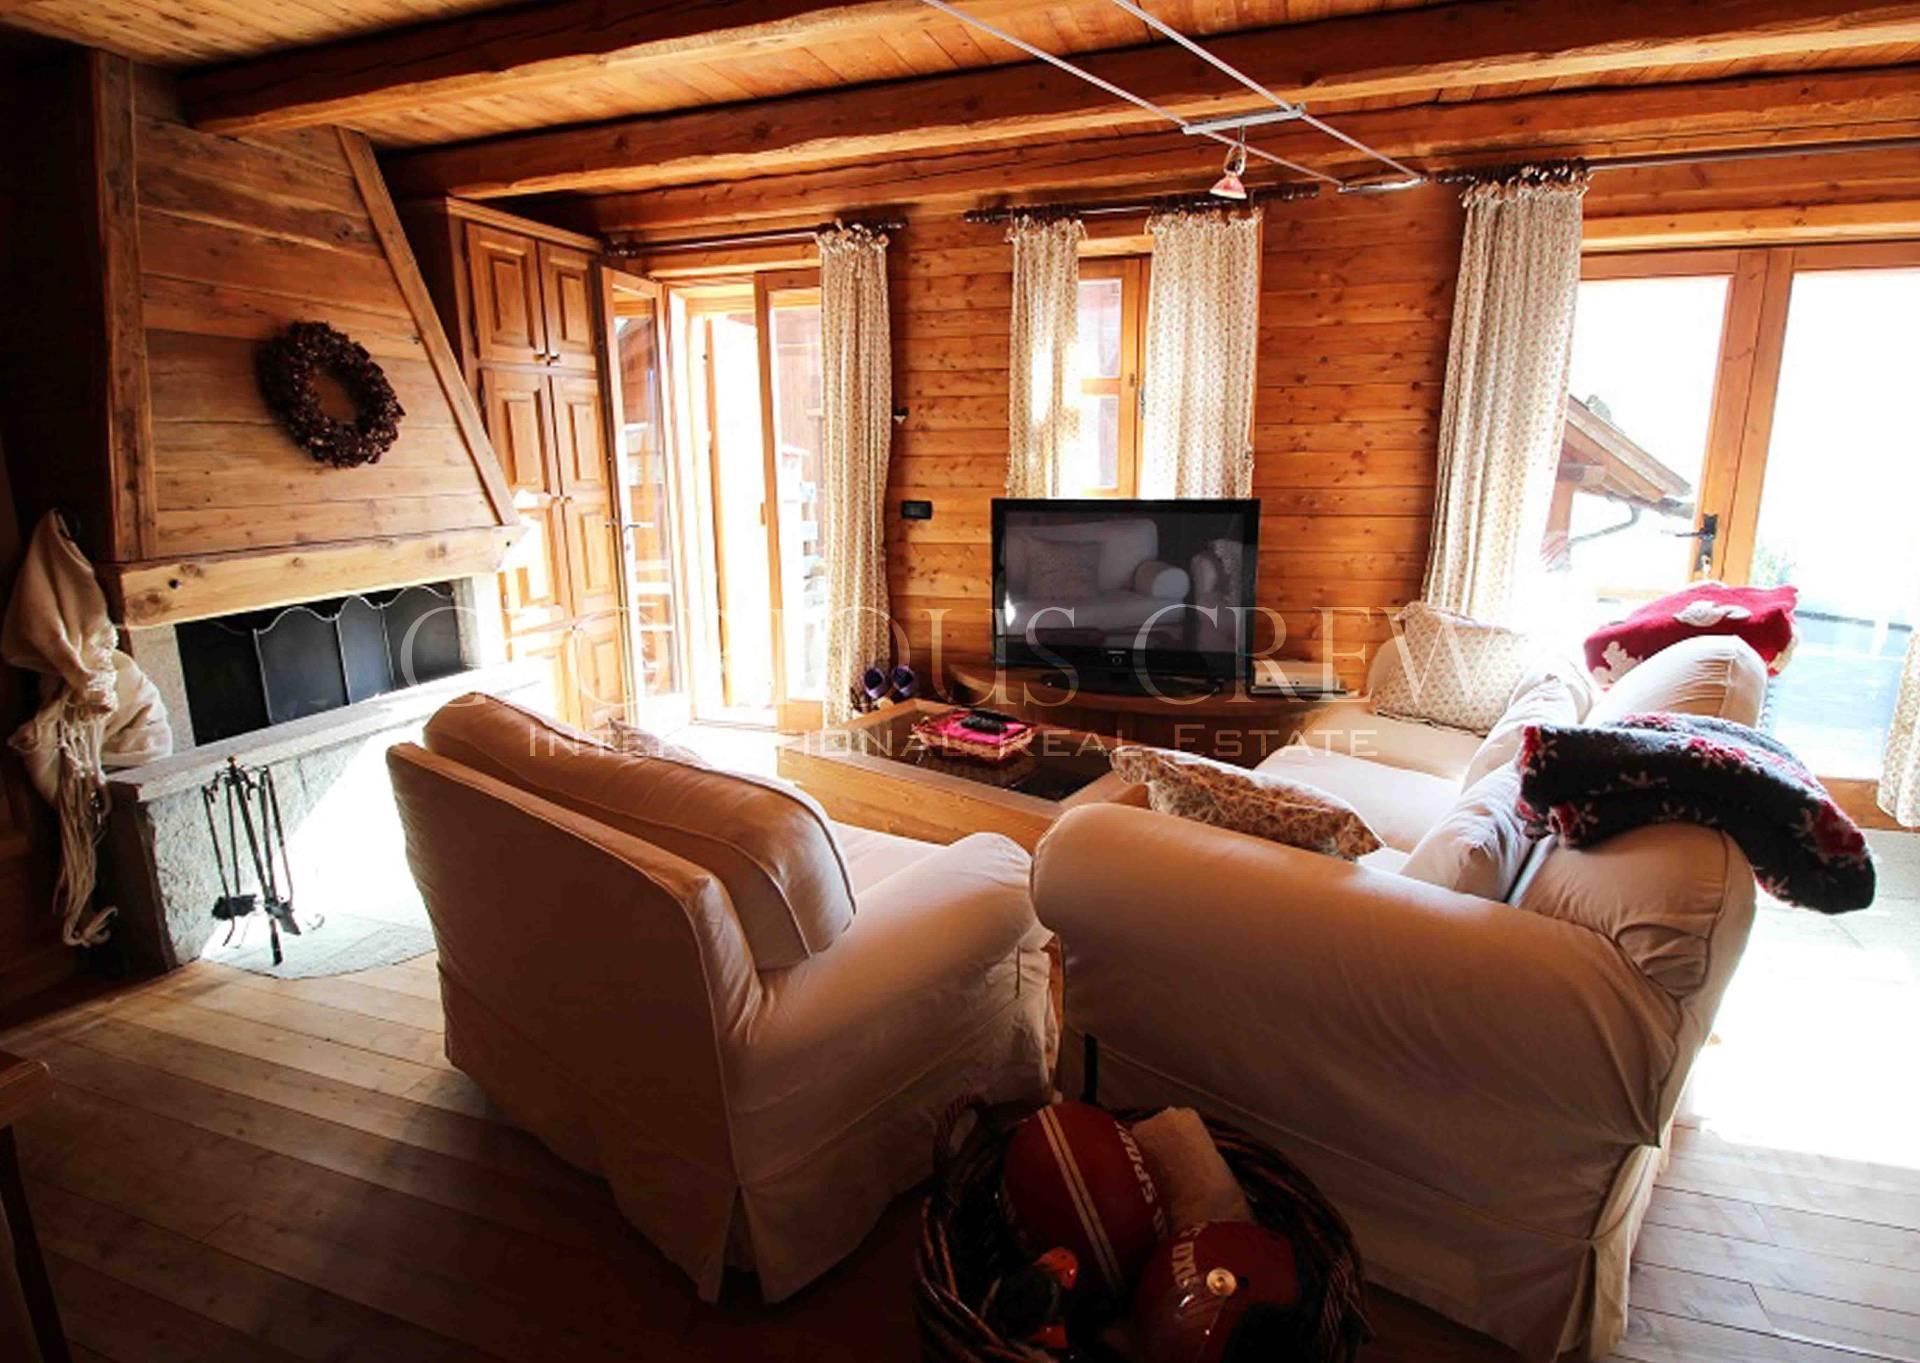 Appartamento in Vendita a Sauze Di Cesana: 3 locali, 76 mq